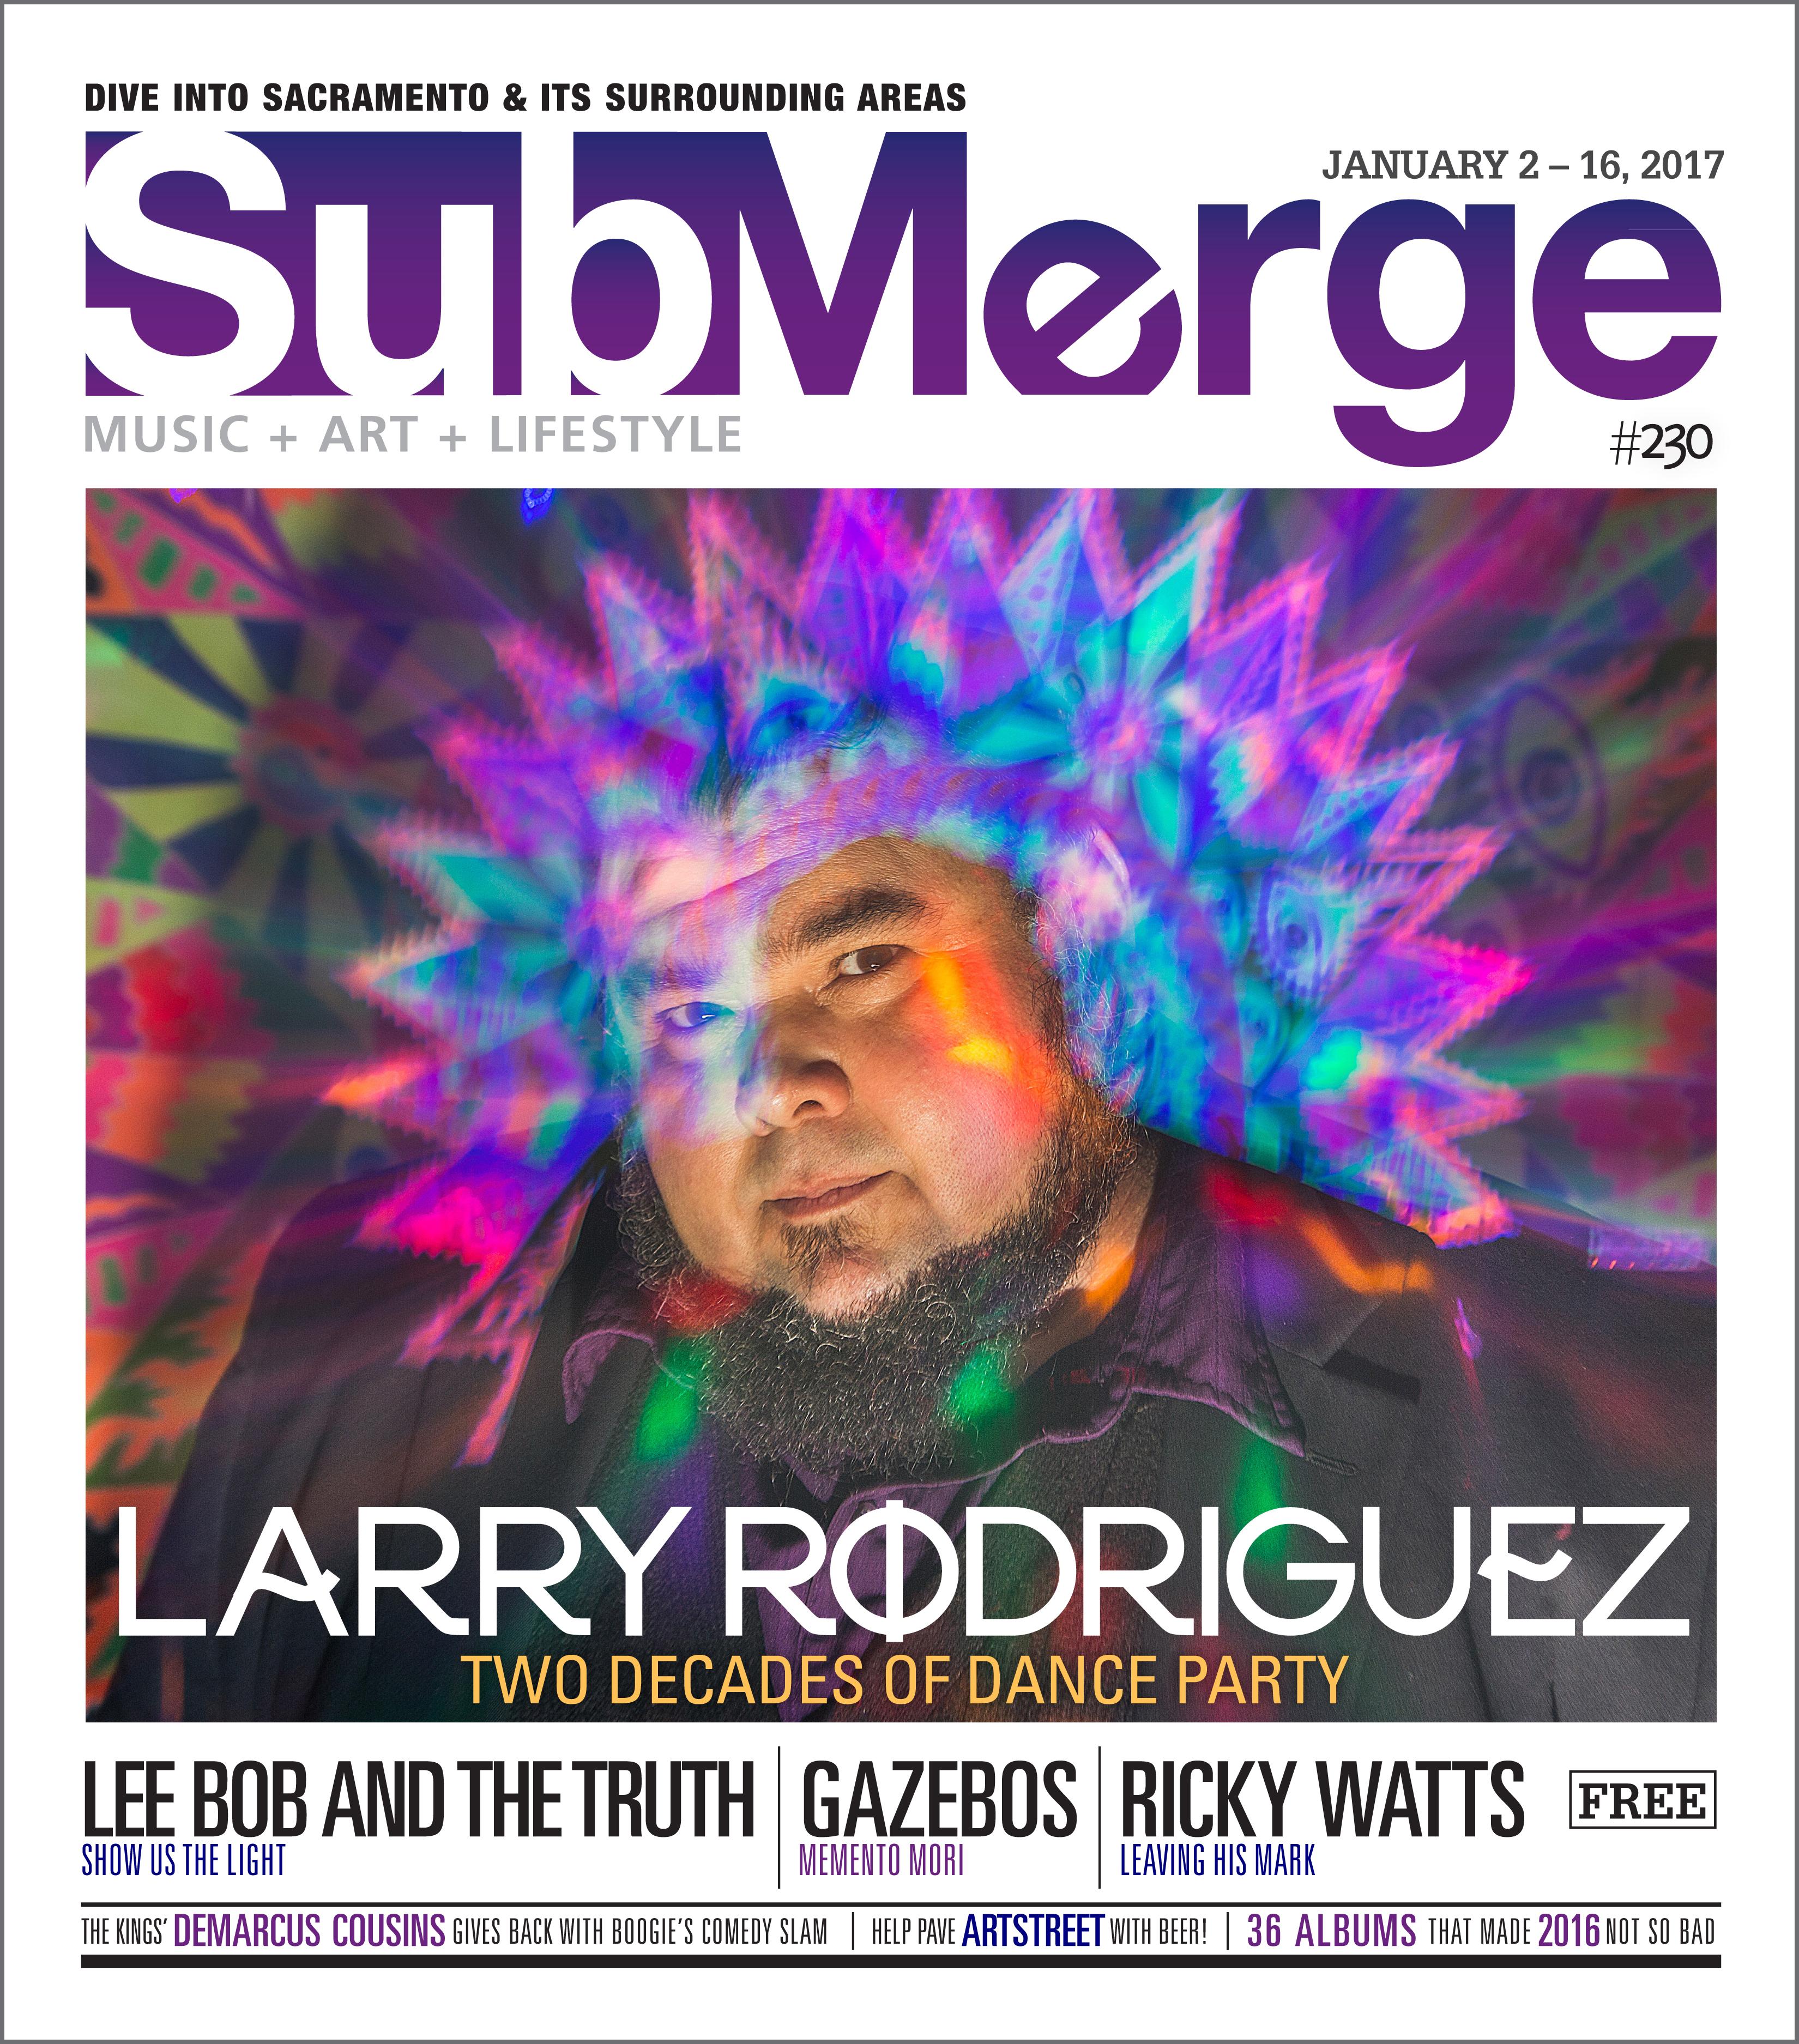 Larry Rodriguez